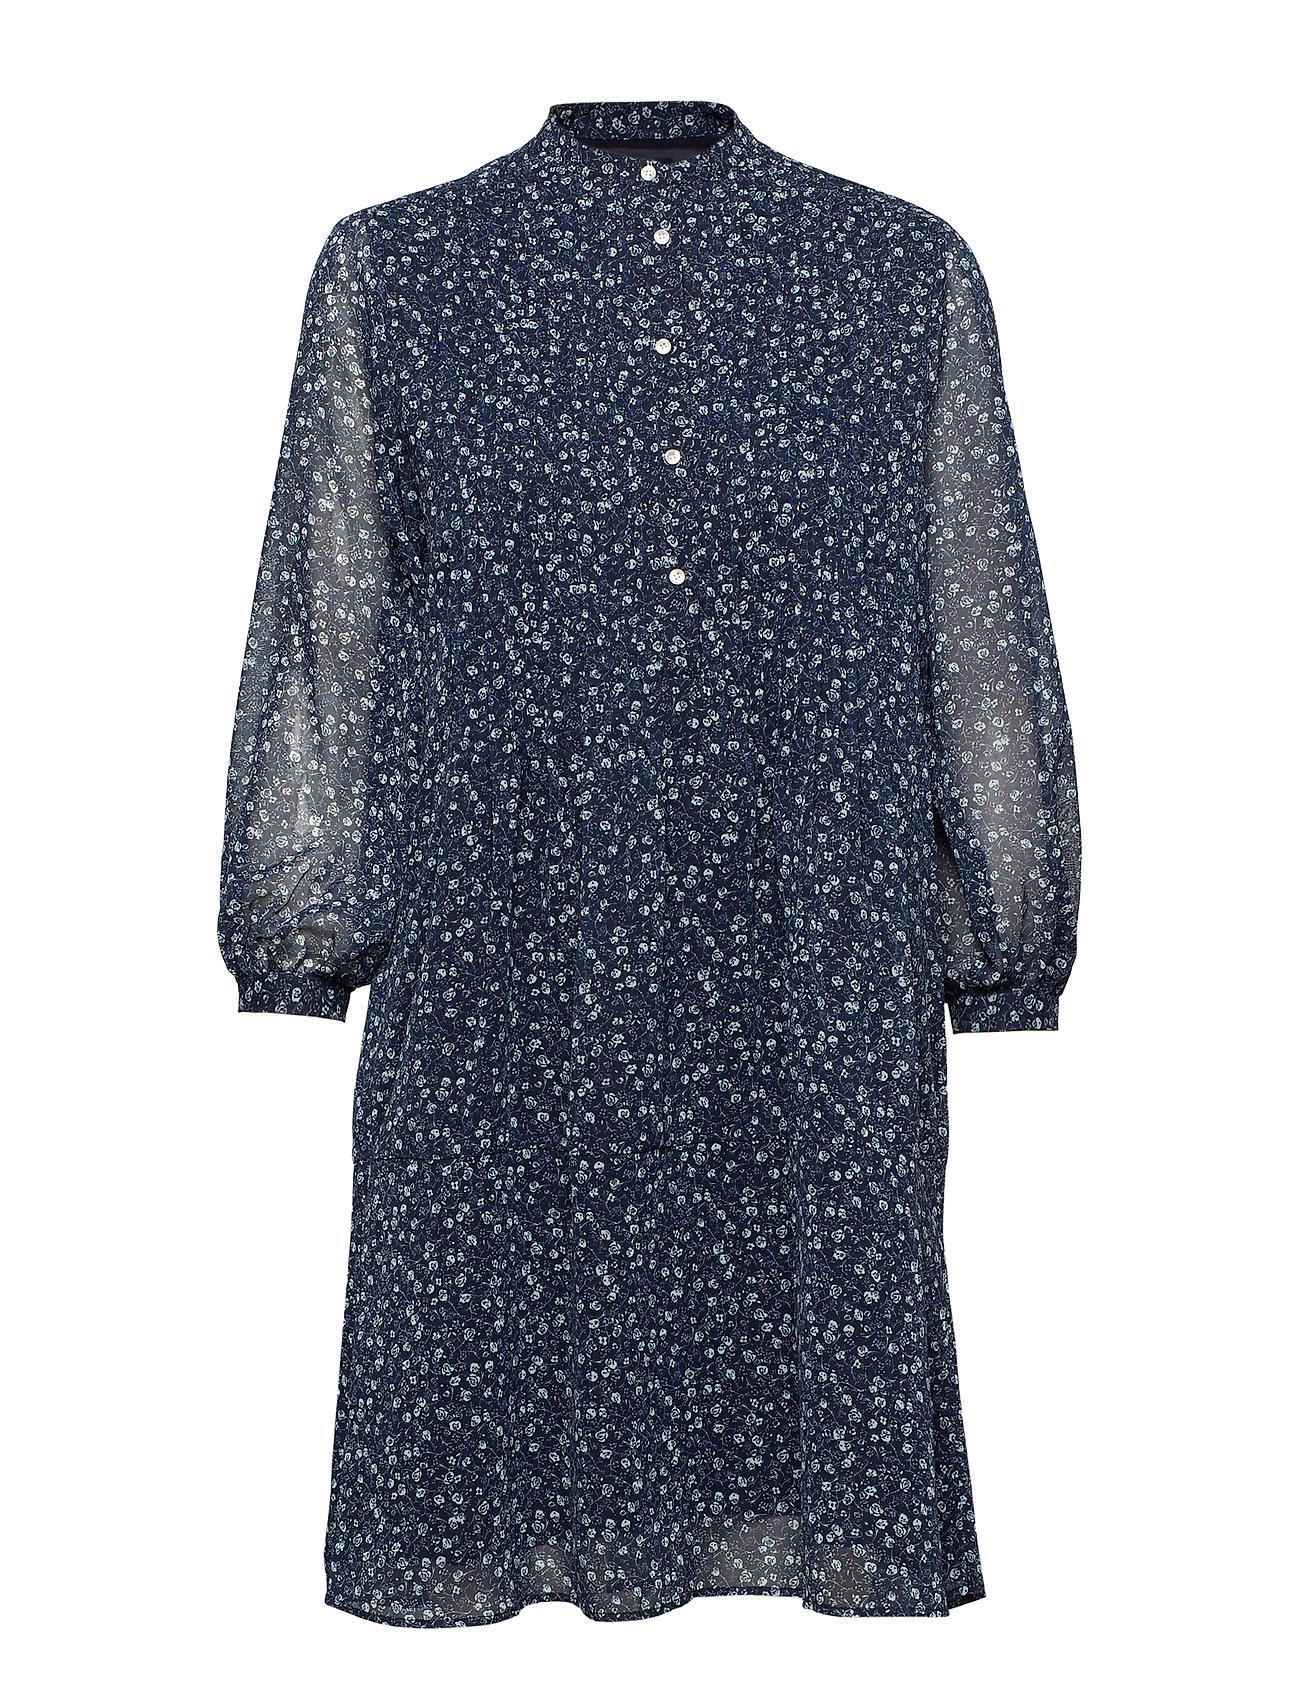 GANT O1. PRINTED CHIFFON DRESS